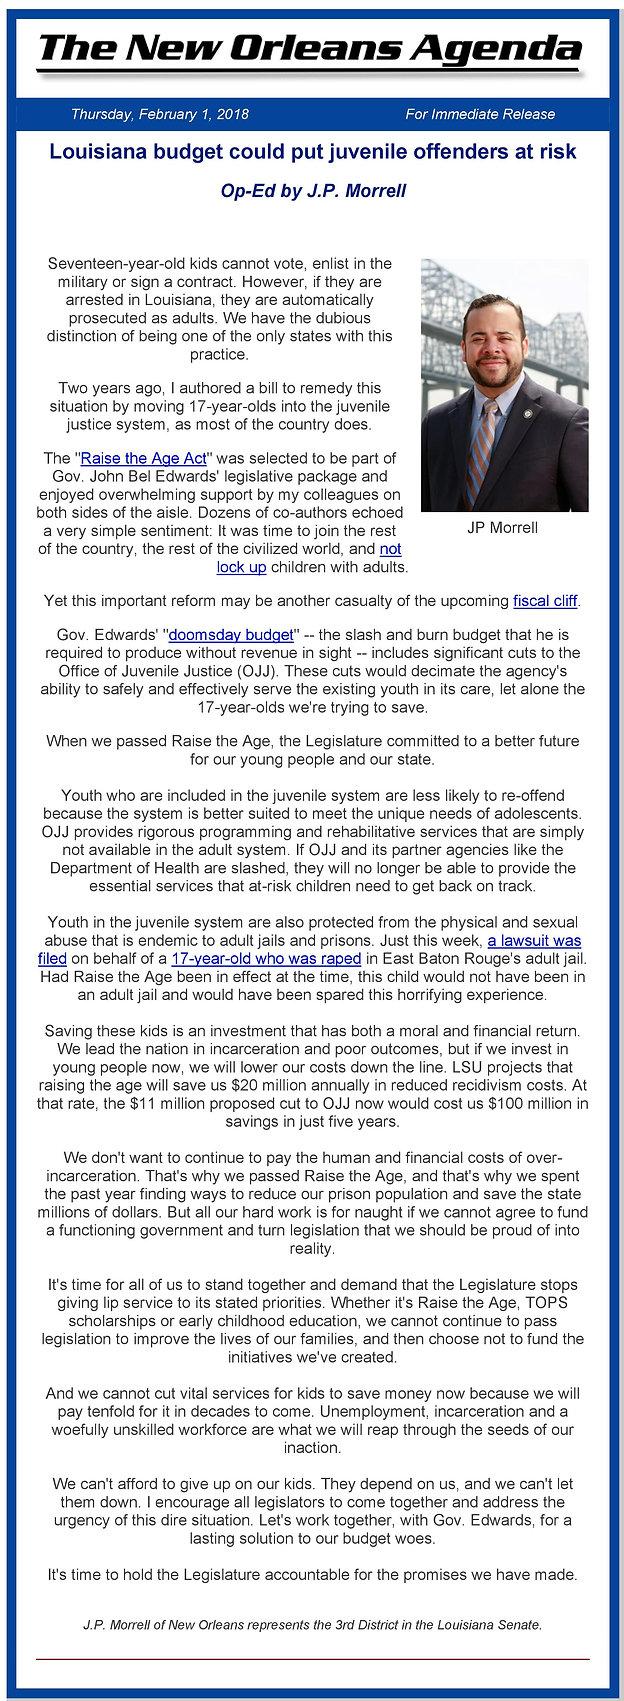 Senator J. P. Morrell offers Op-Ed on Louisiana budget's impact on juvenile offenders